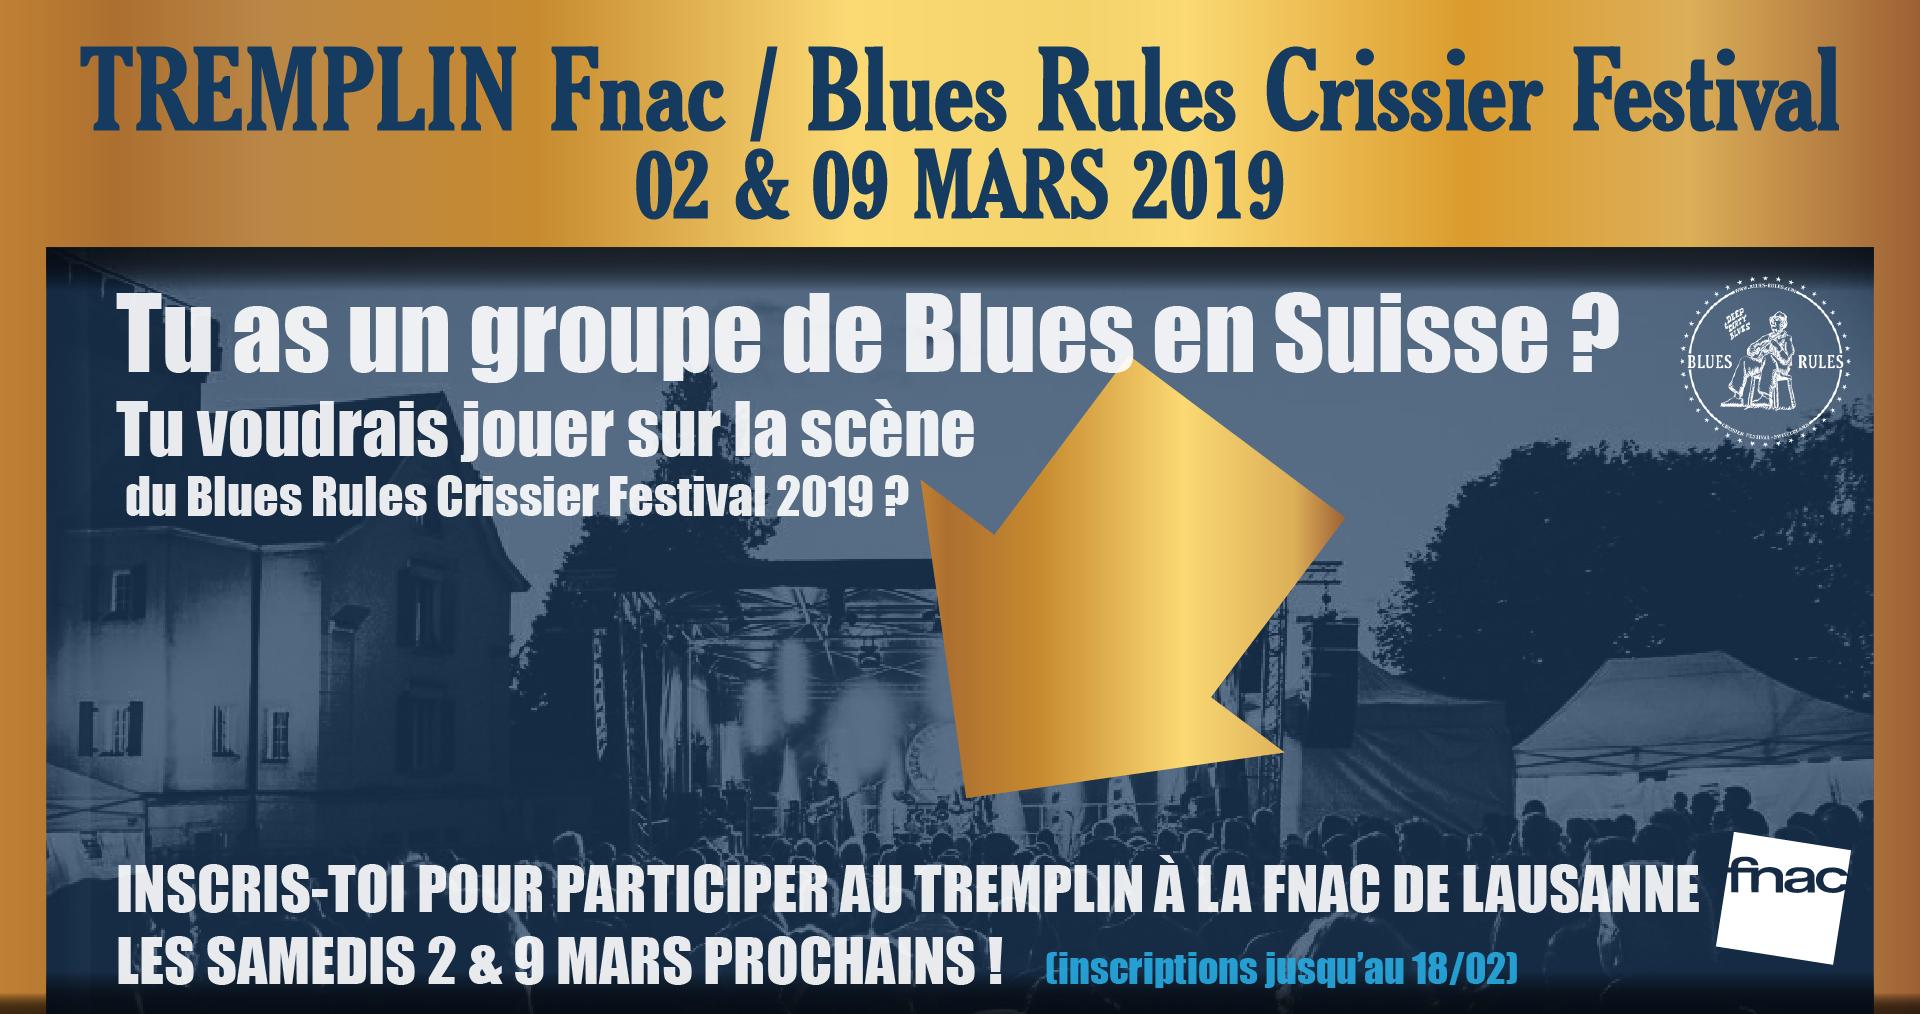 Tremplin Blues Rules / Fnac 2019